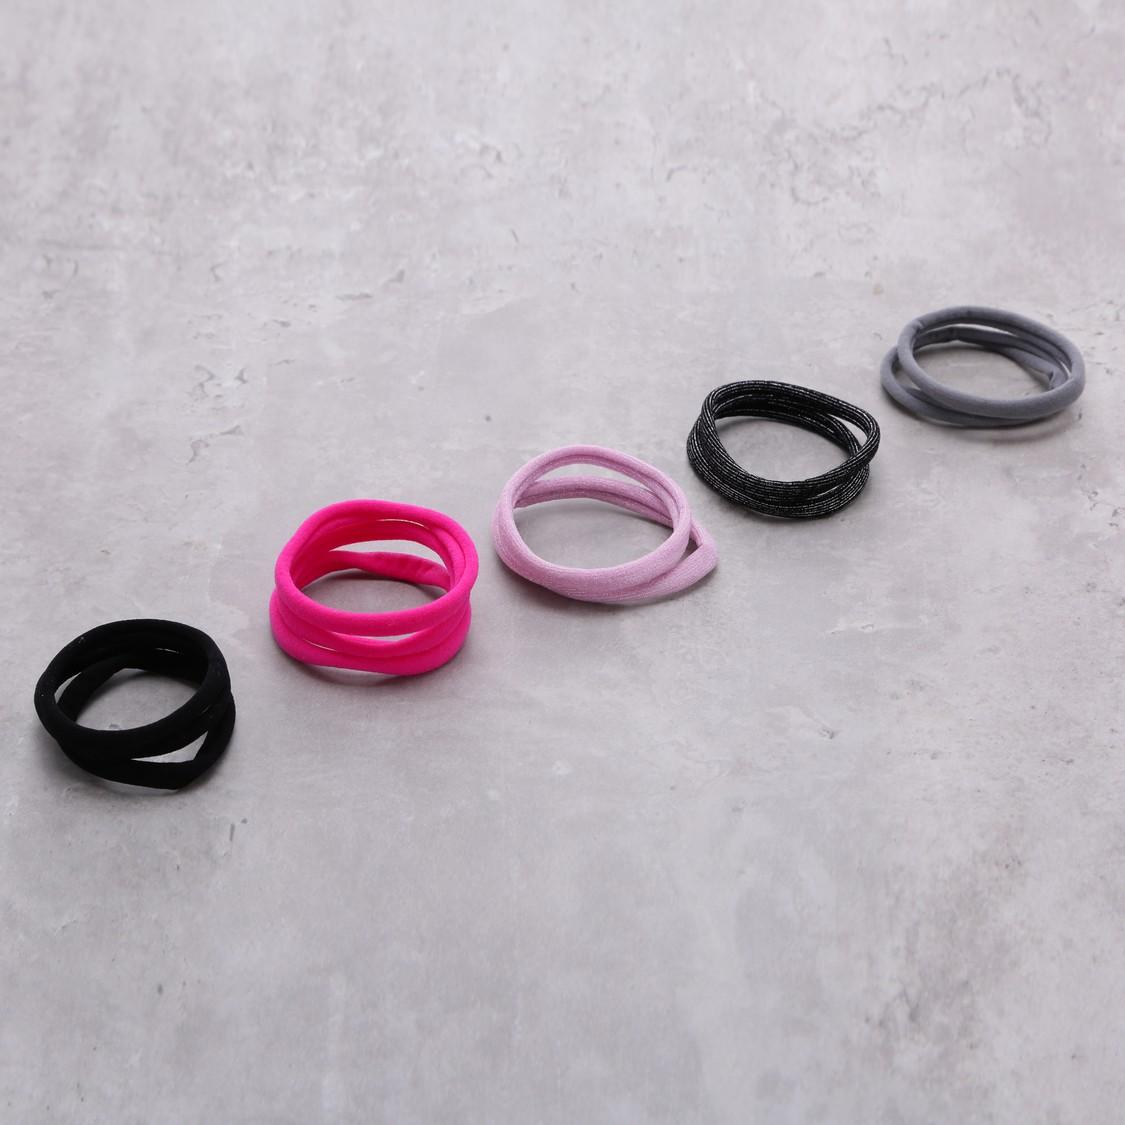 Round Elasticised Bands Set